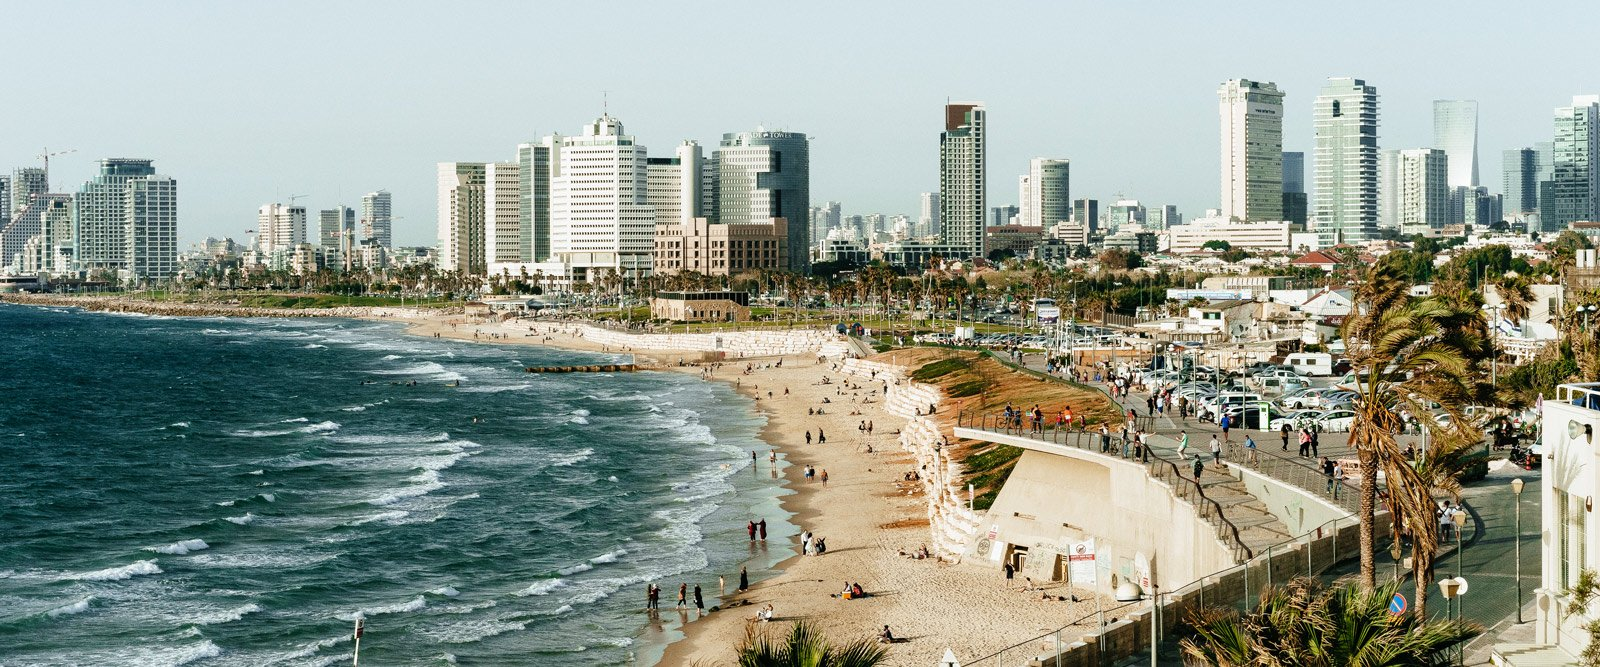 The shoreline in Israel